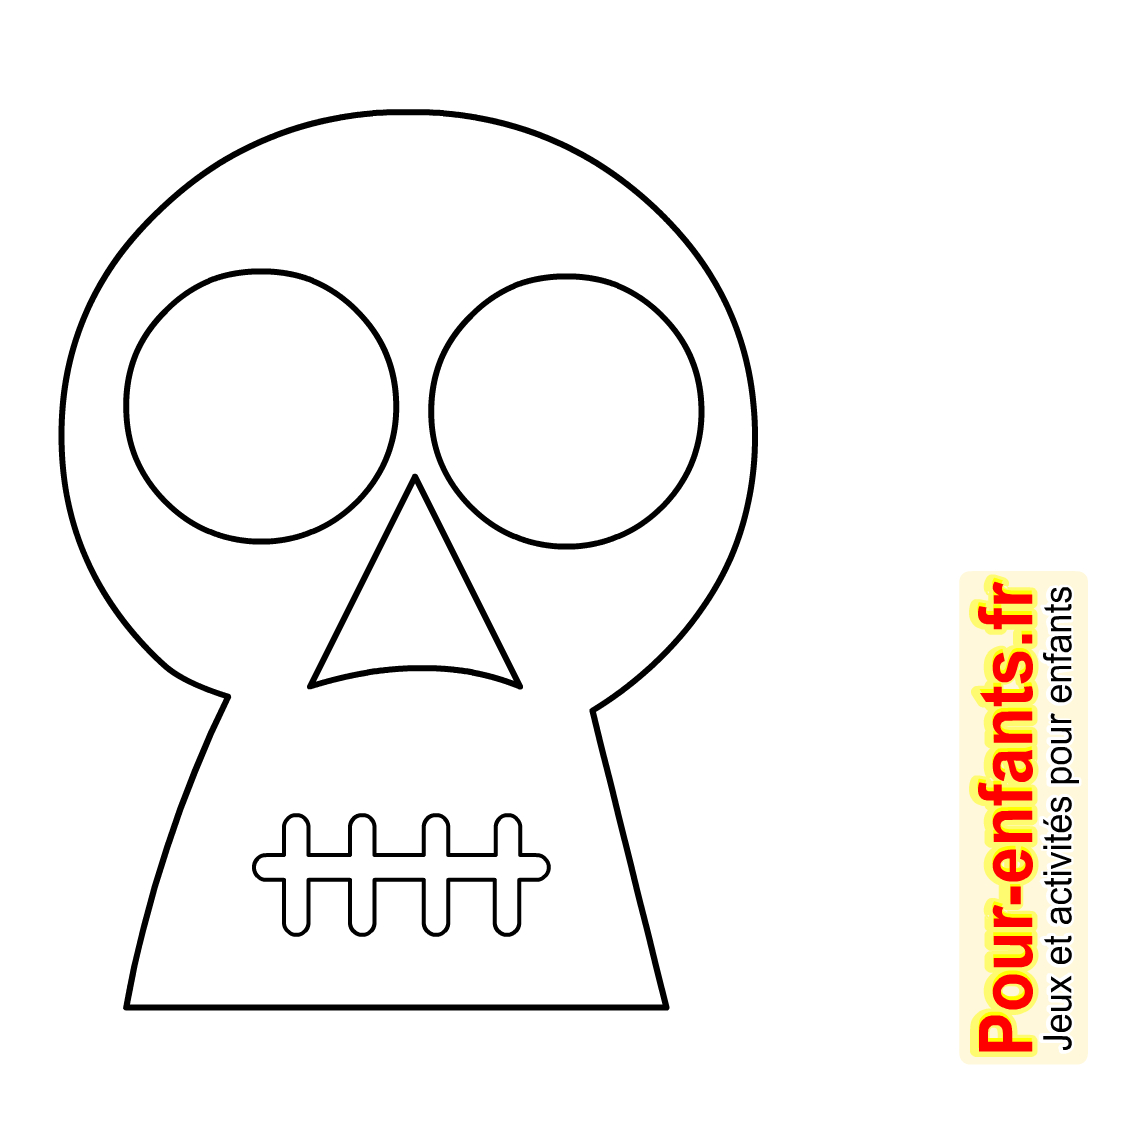 Dessins Tête De Mort Dessin Coloriage Tete De Mort Halloween concernant Dessin D Halloween Facile A Dessiner